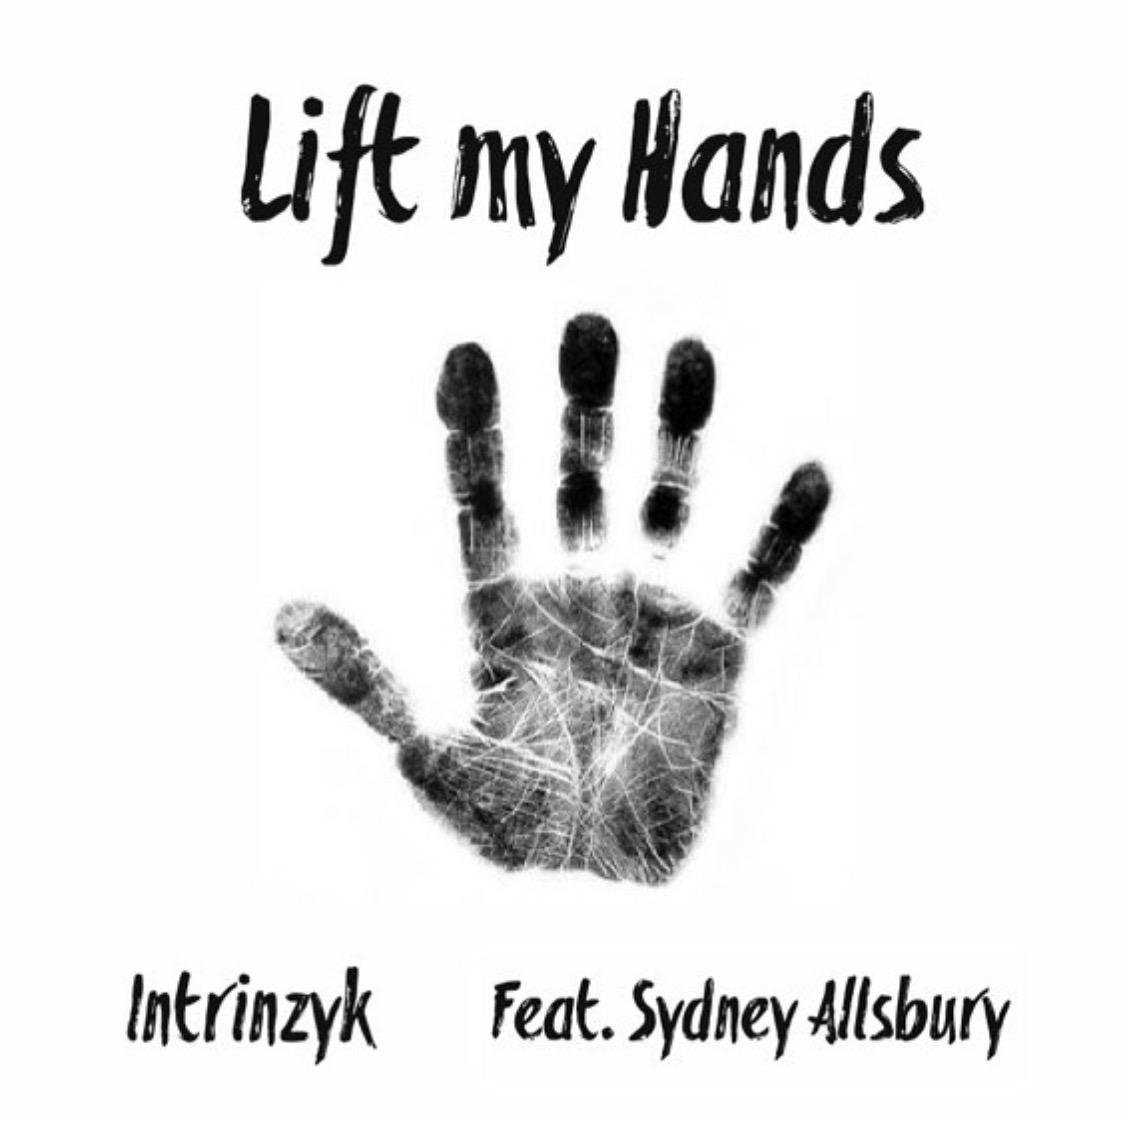 Intrinzyk - Lift My Hands Feat. Sydney Allsbury